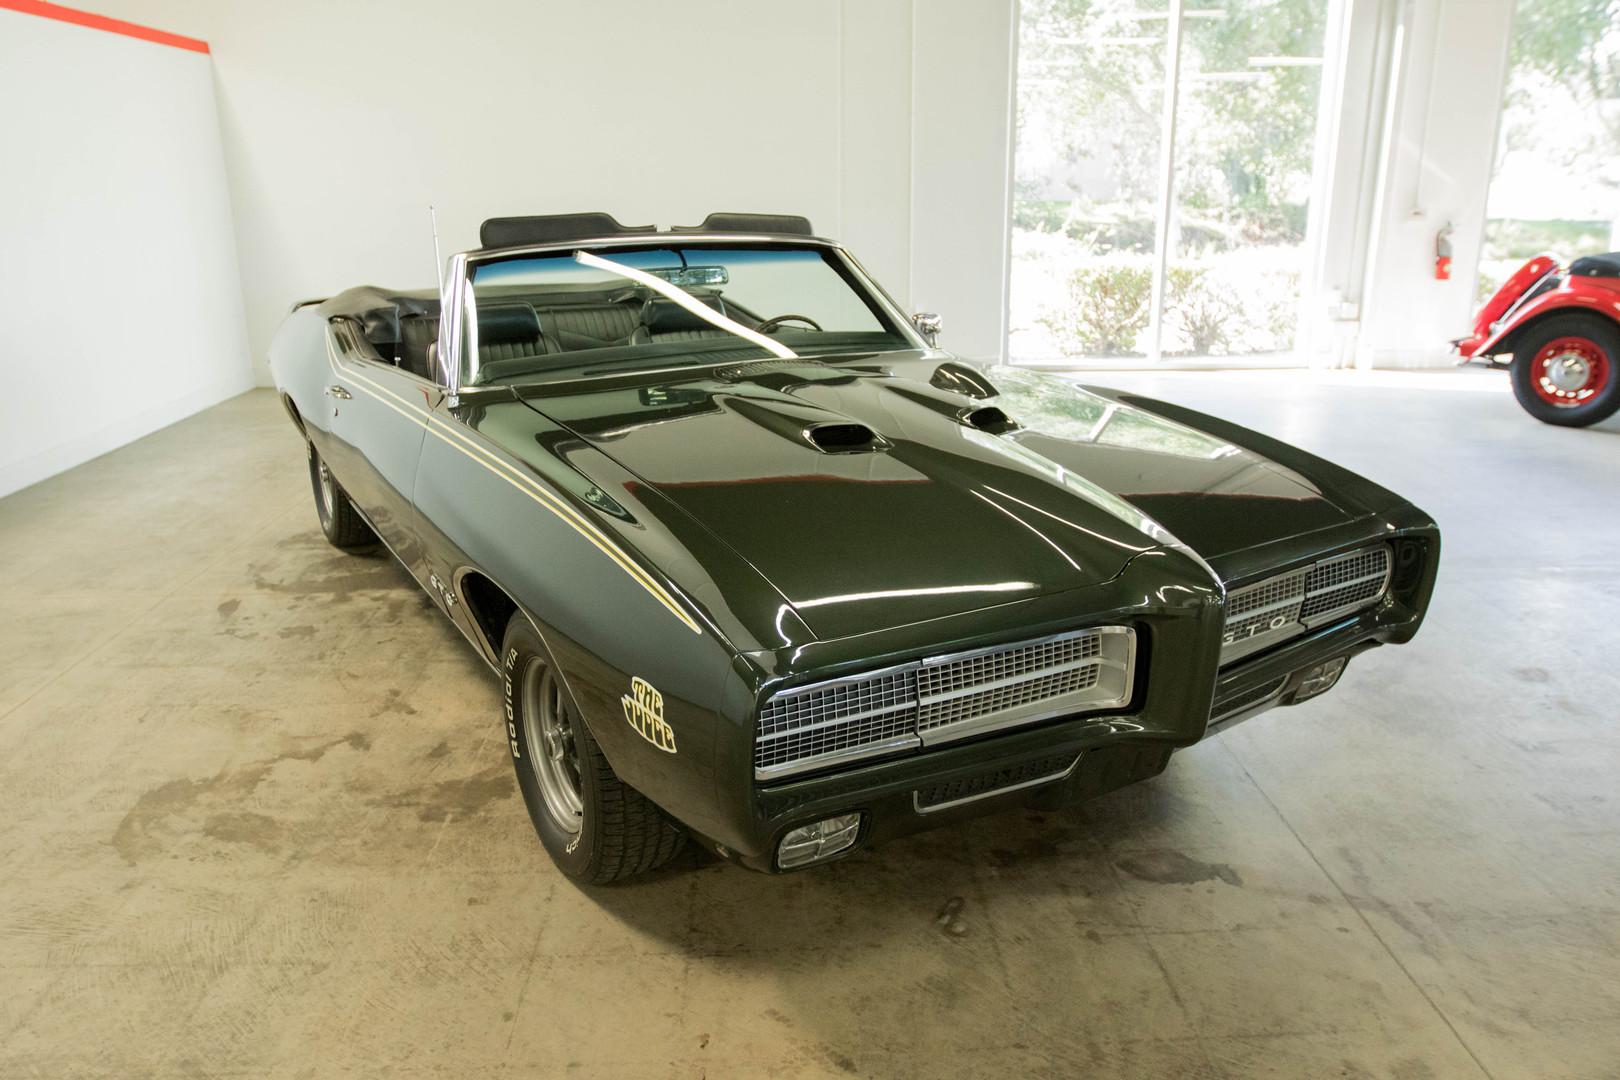 hight resolution of 1969 pontiac gto 2 door convertible 7f361d4036 jpg